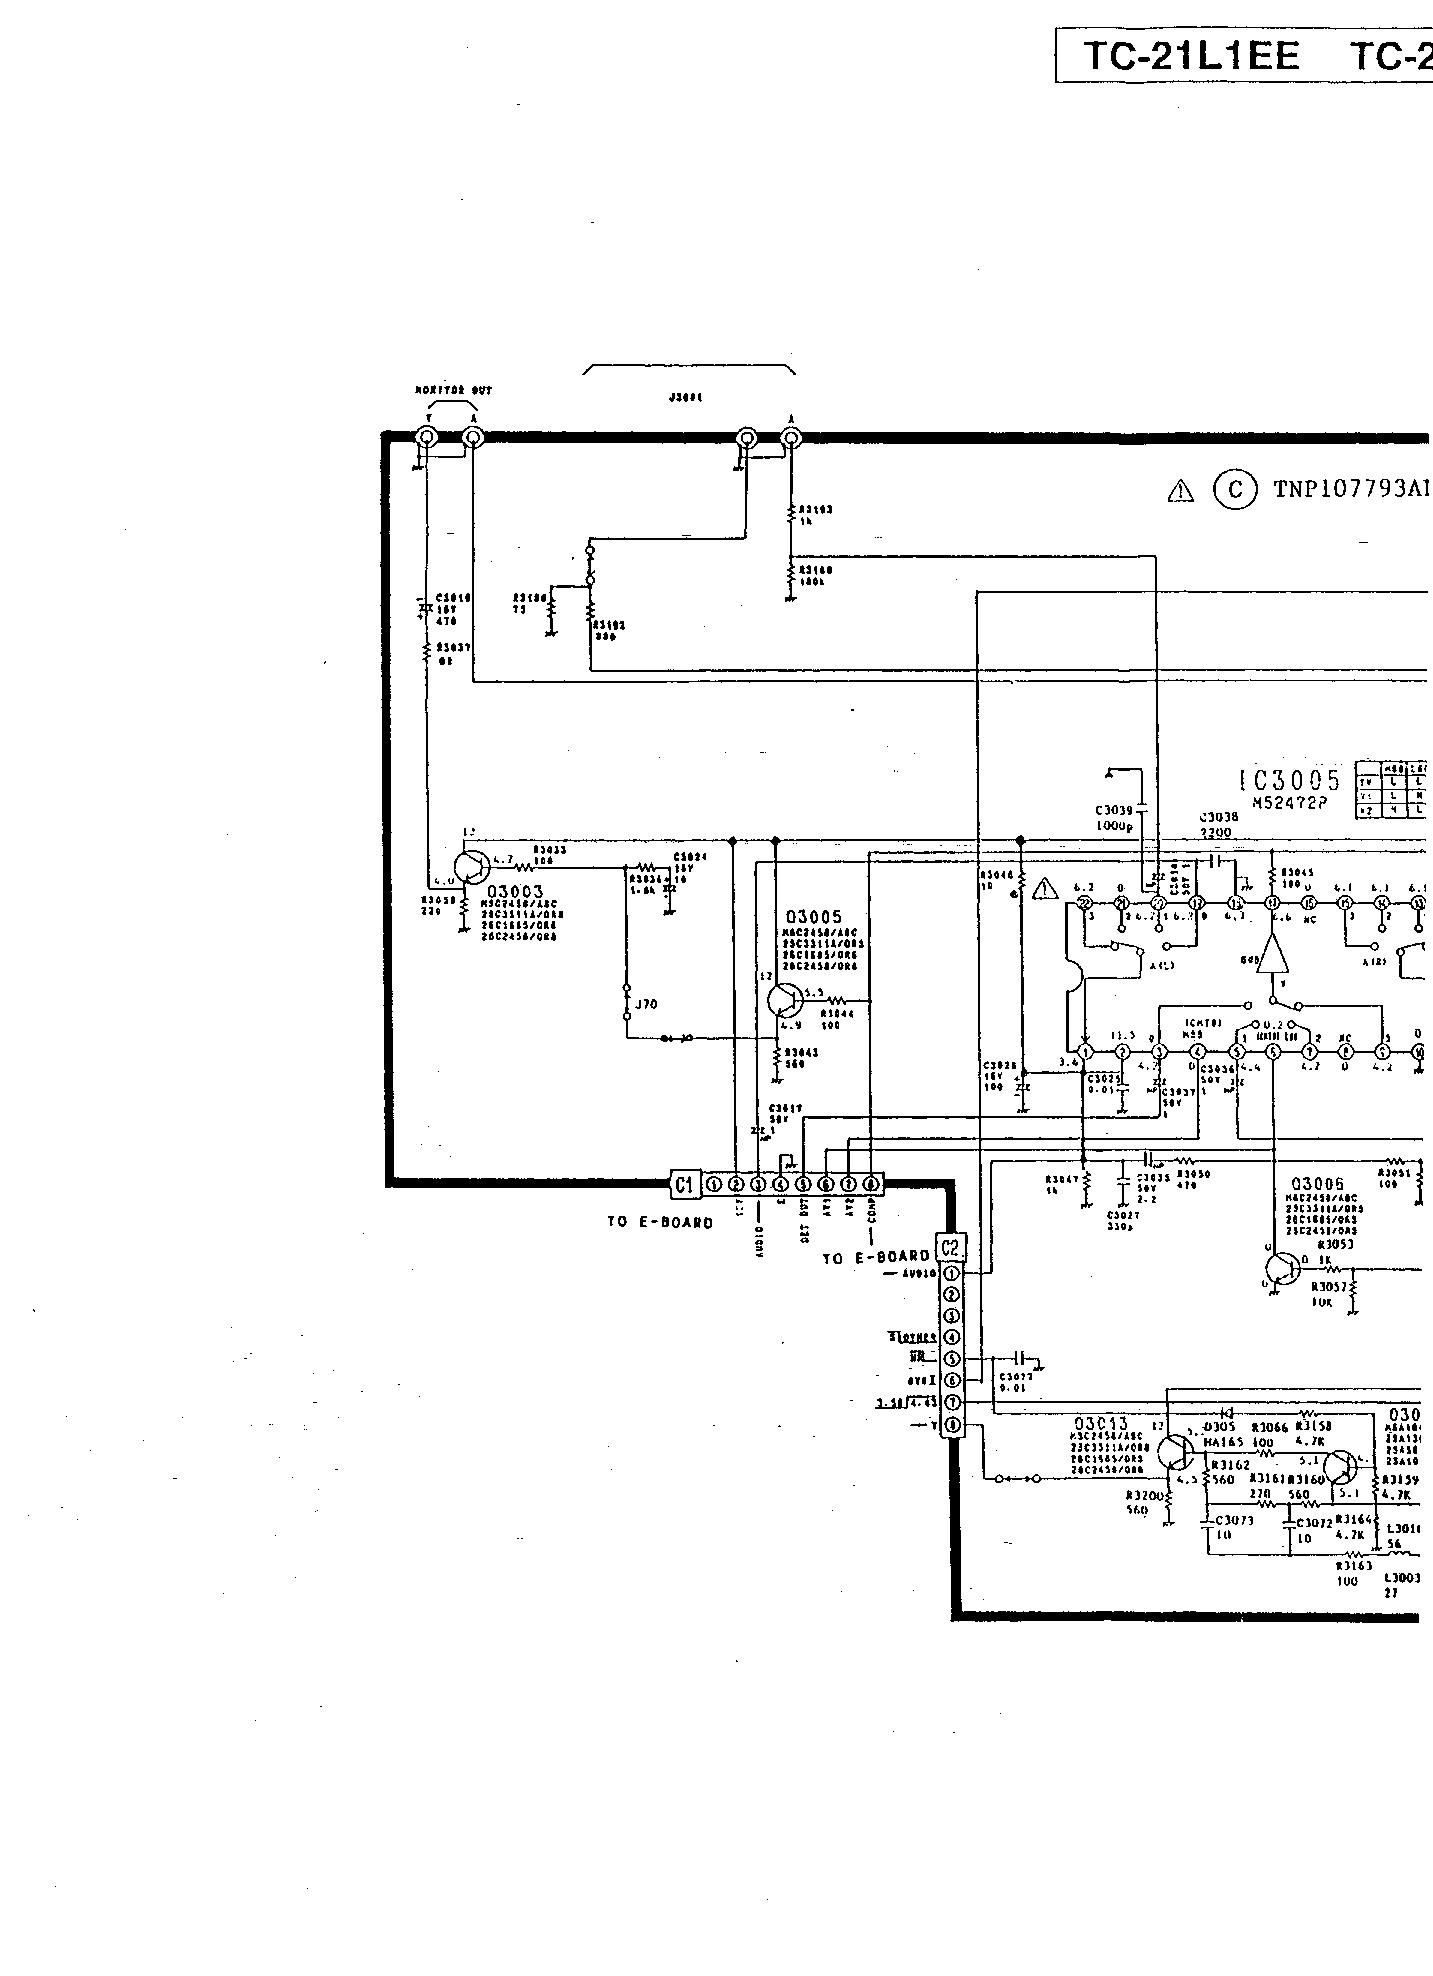 Vacuum Diagram 1983 Eldorado 4100 Fixya